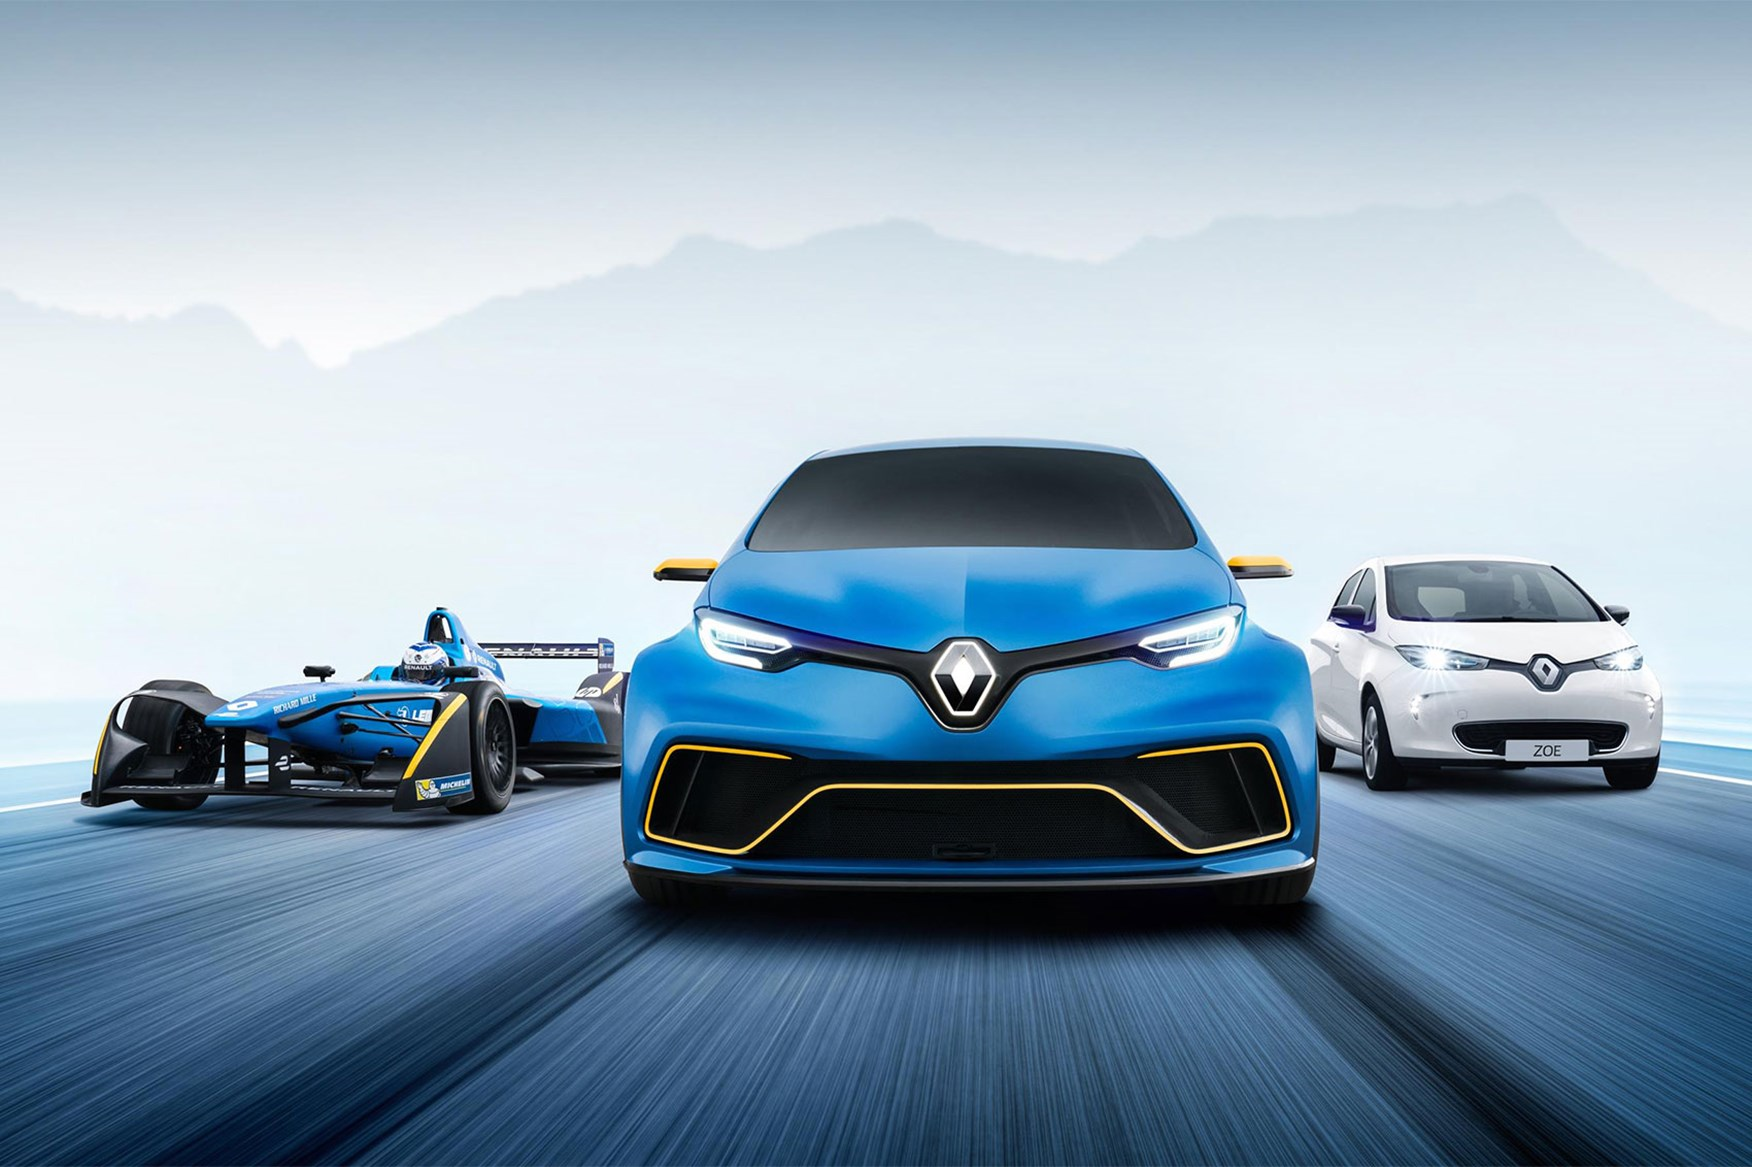 Hyper Sport 2017 >> Renault Zoe e-Sport muscles up with 460bhp EV hyper-hatch by CAR Magazine